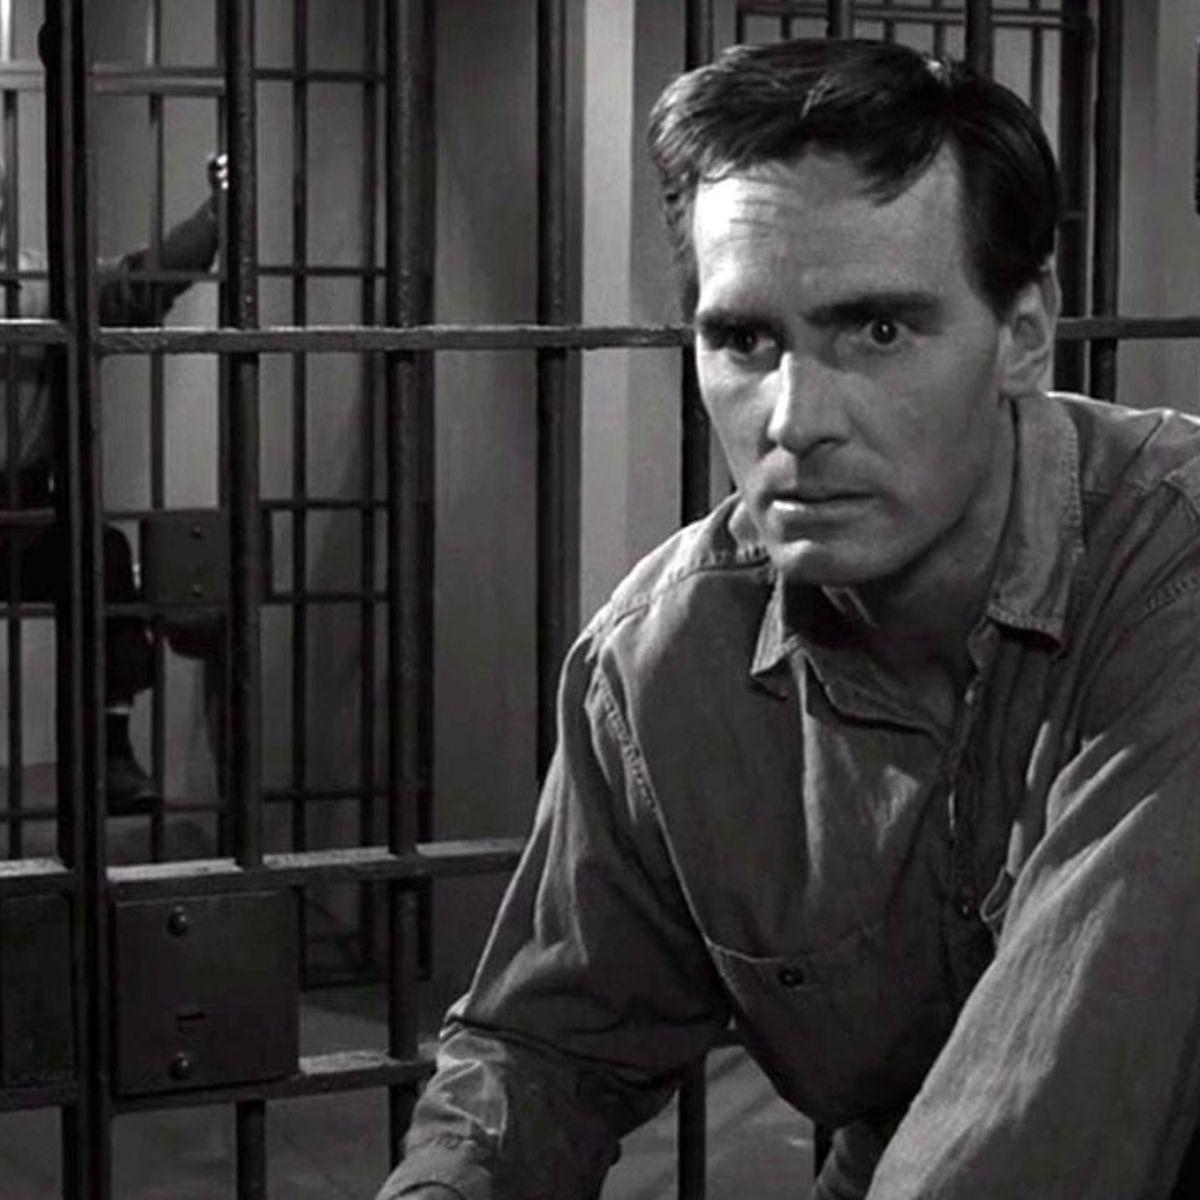 june 4 in twilight zone history remembering actor dennis weaver on